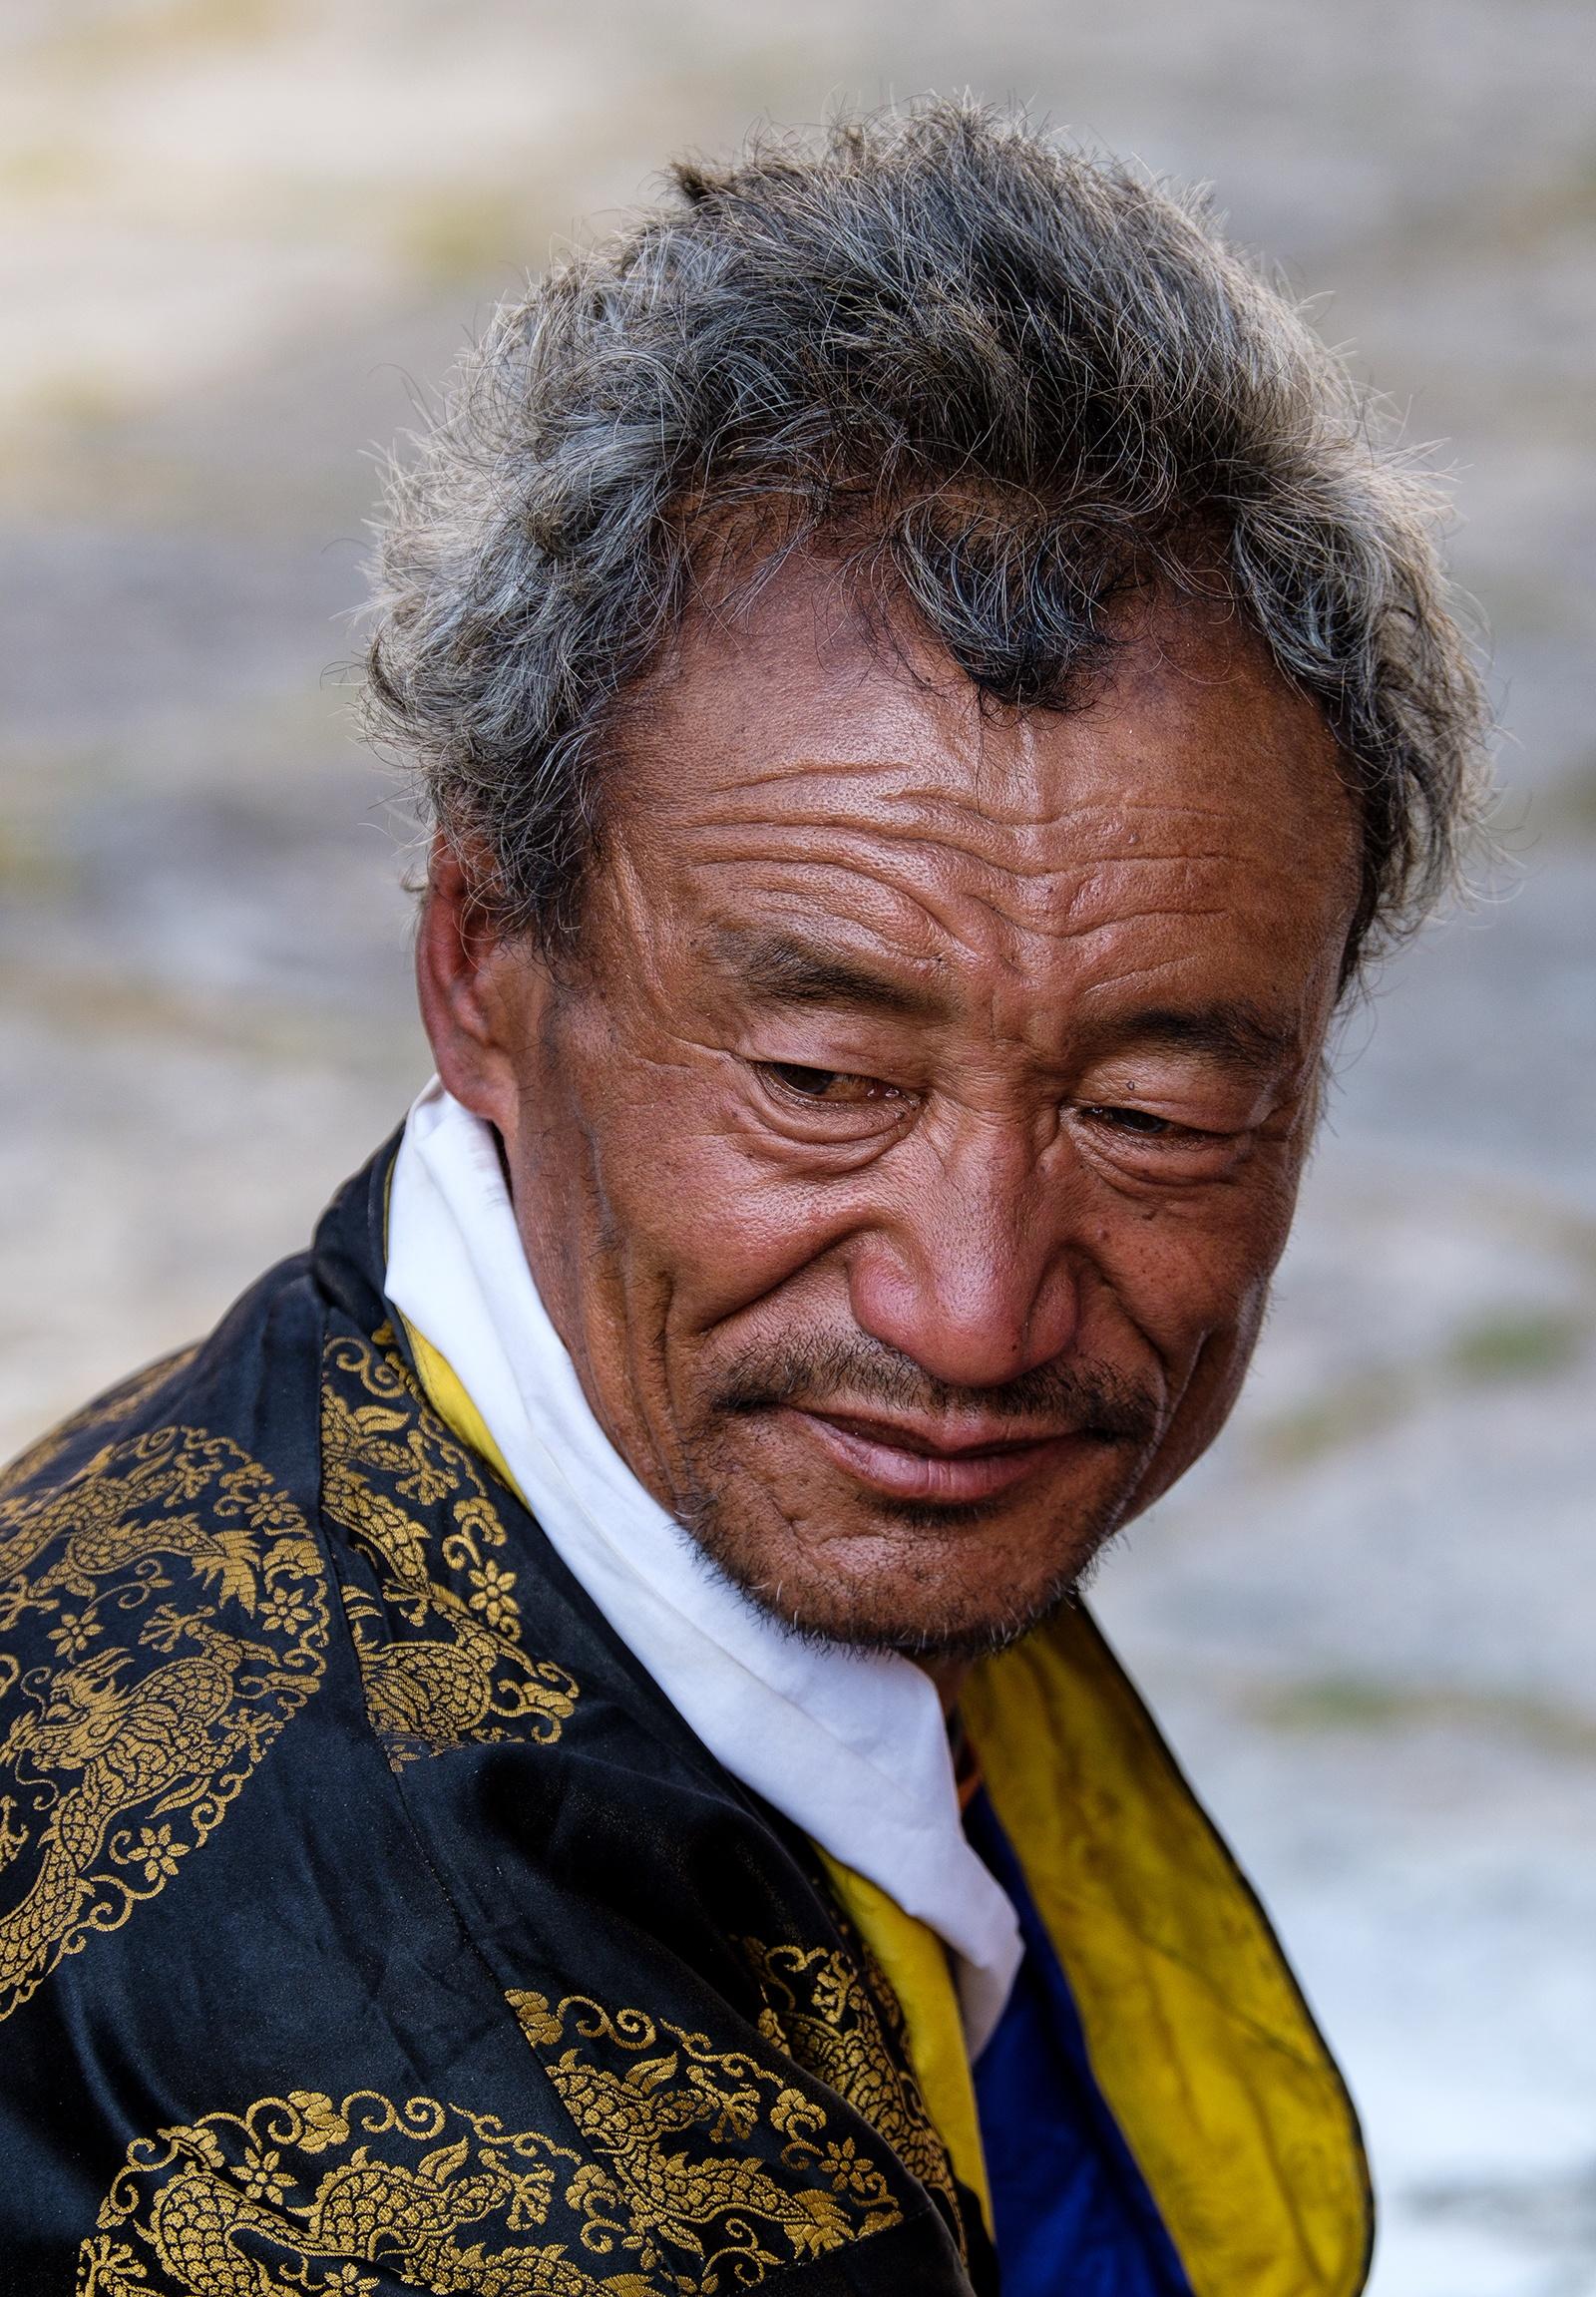 Festival Spectator, Paro, Bhutan - XH1 + 50-140mm + 1.4xTC